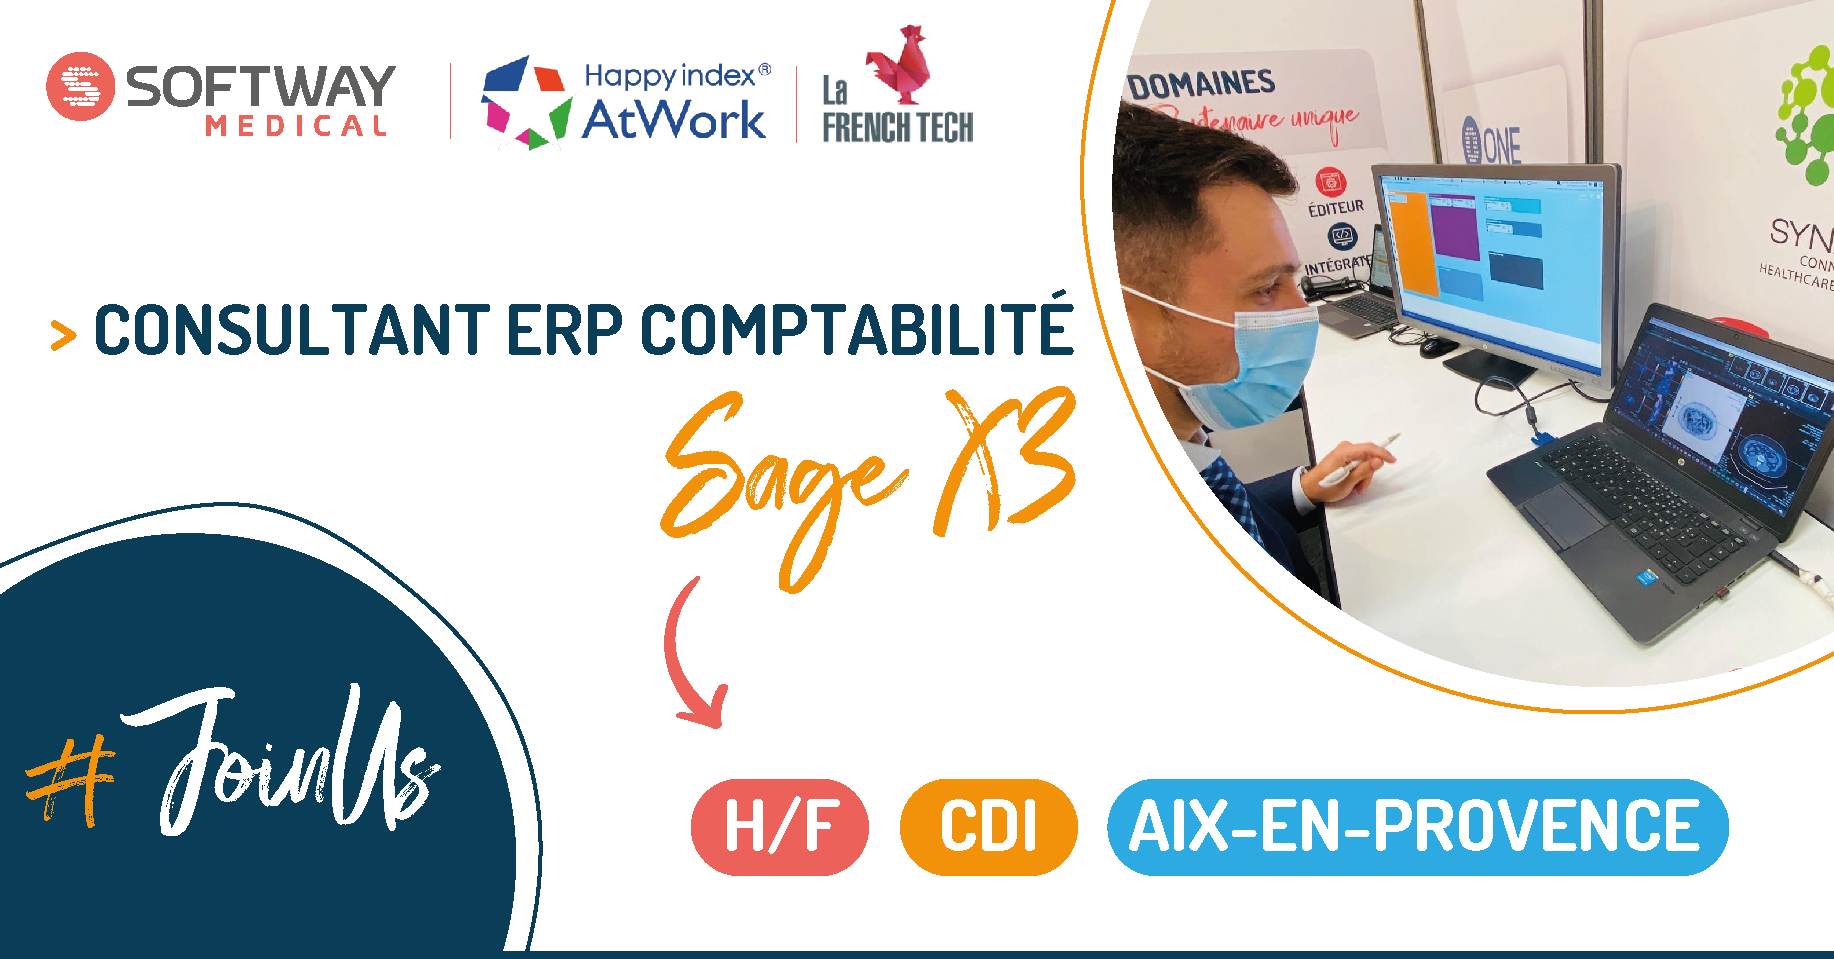 CONSULTANT ERP COMPTABILITE SAGE X3- H/F – Aix-En-Provence